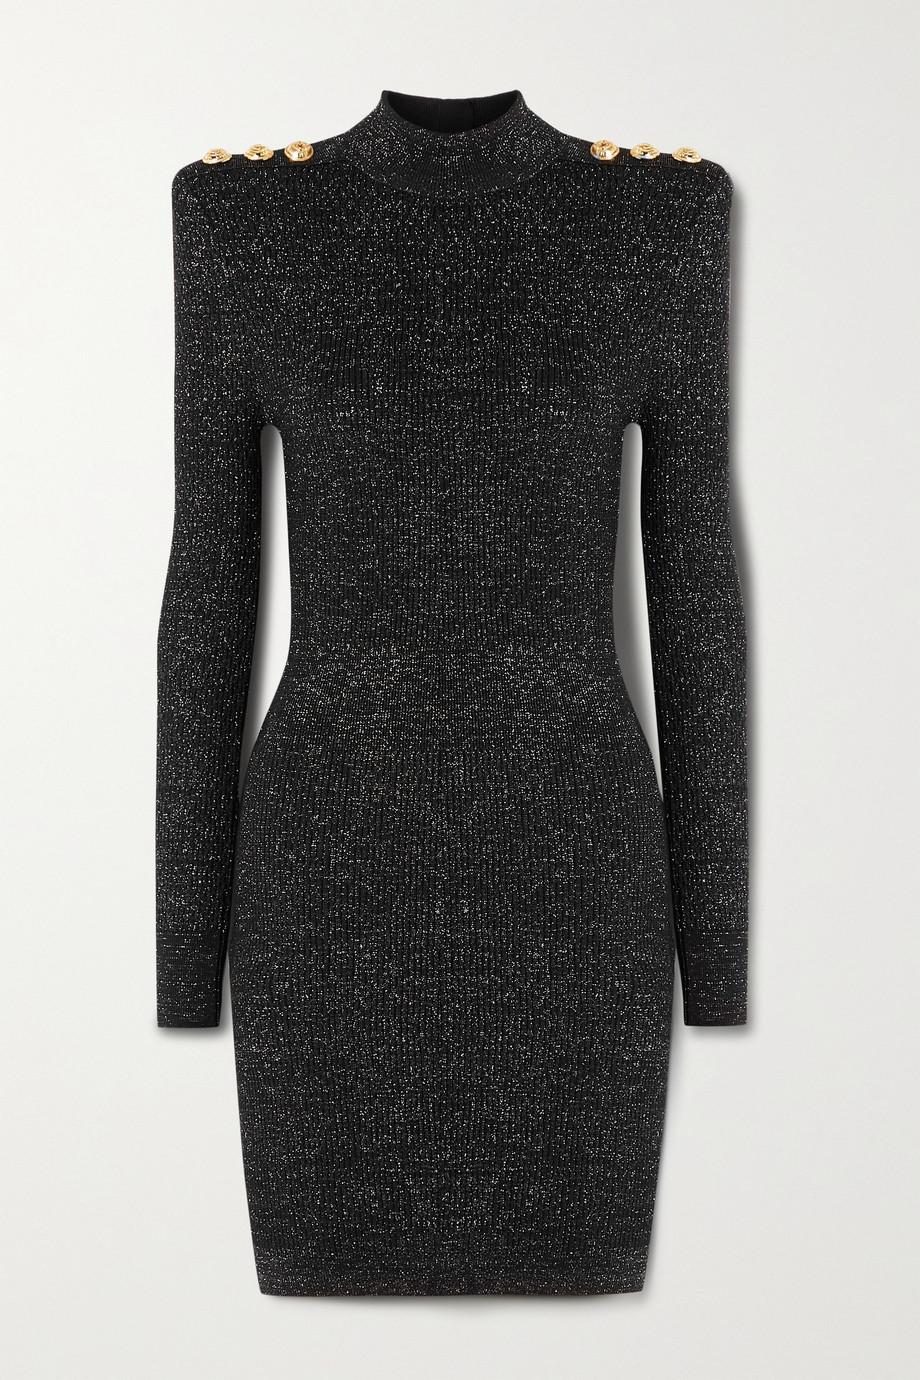 Balmain Button-embellished metallic ribbed-knit turtleneck mini dress